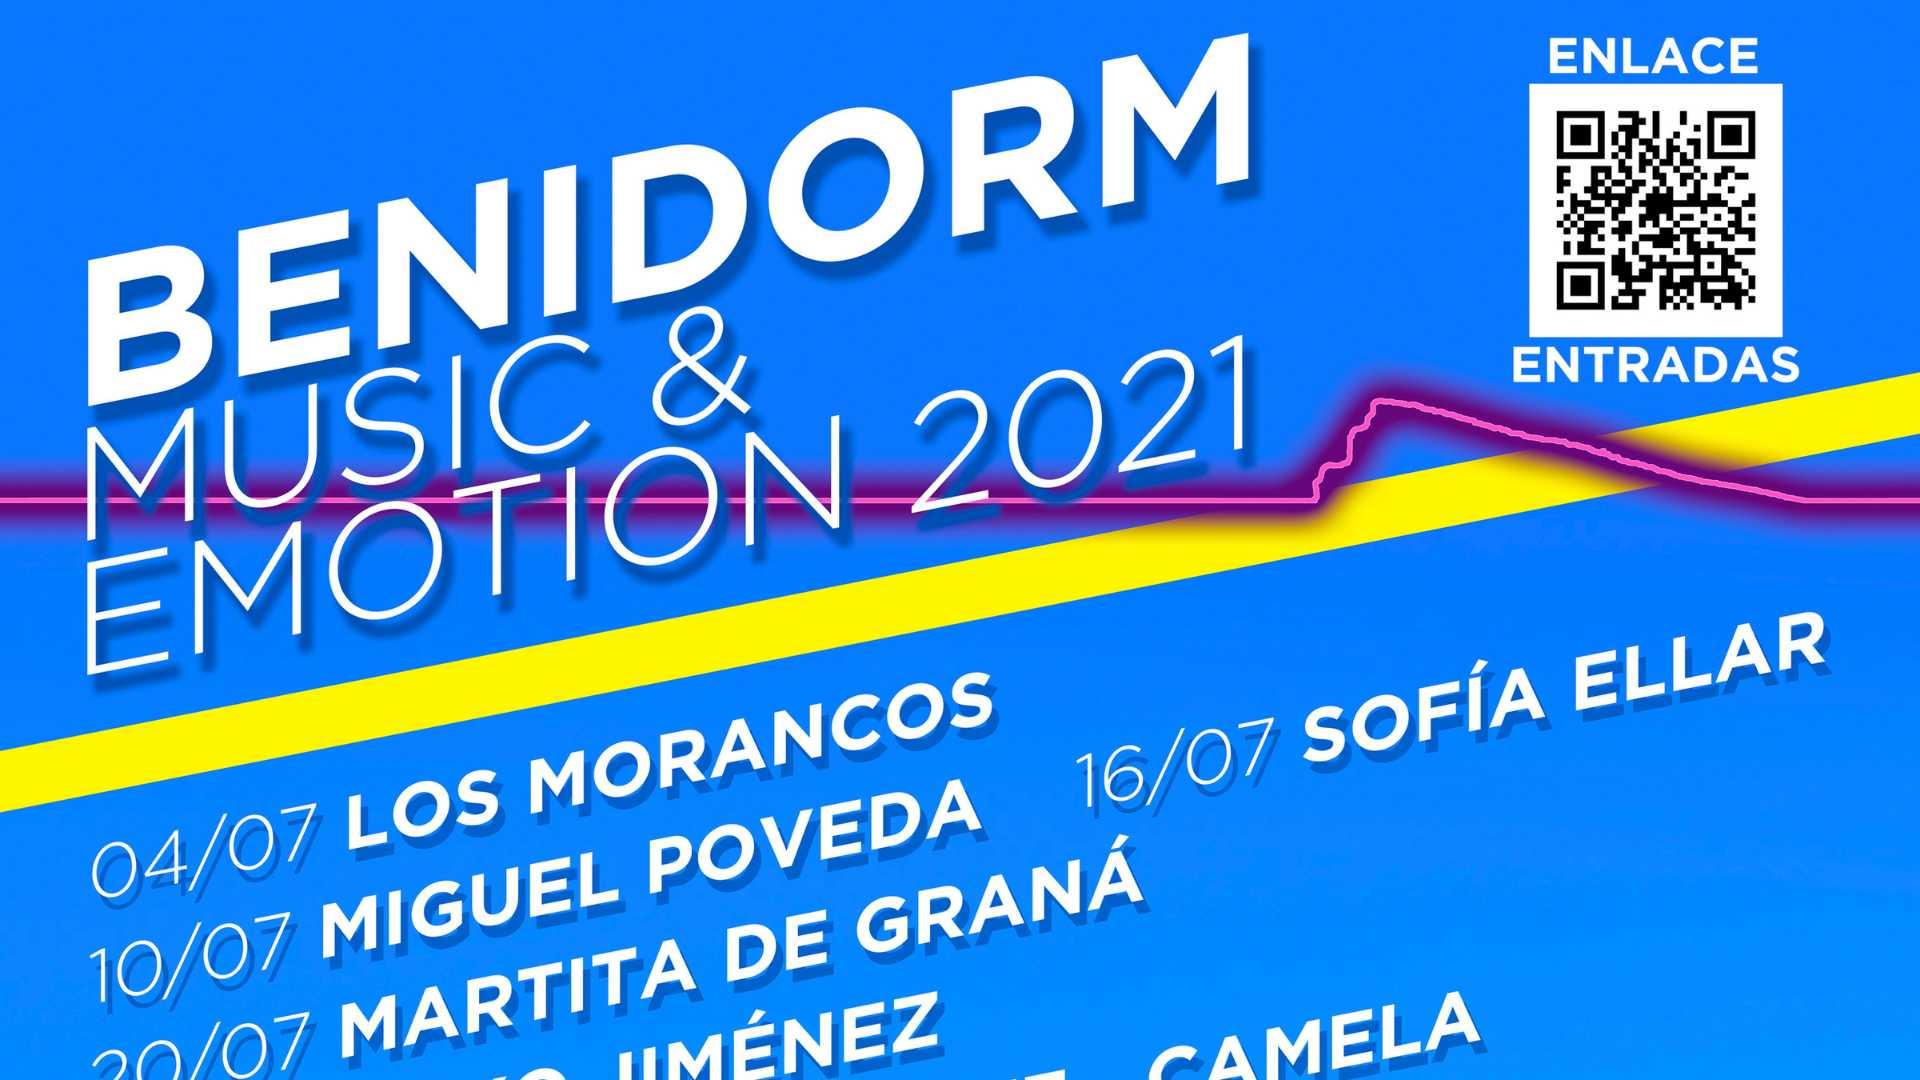 Benidorm Music & Emotion 2021